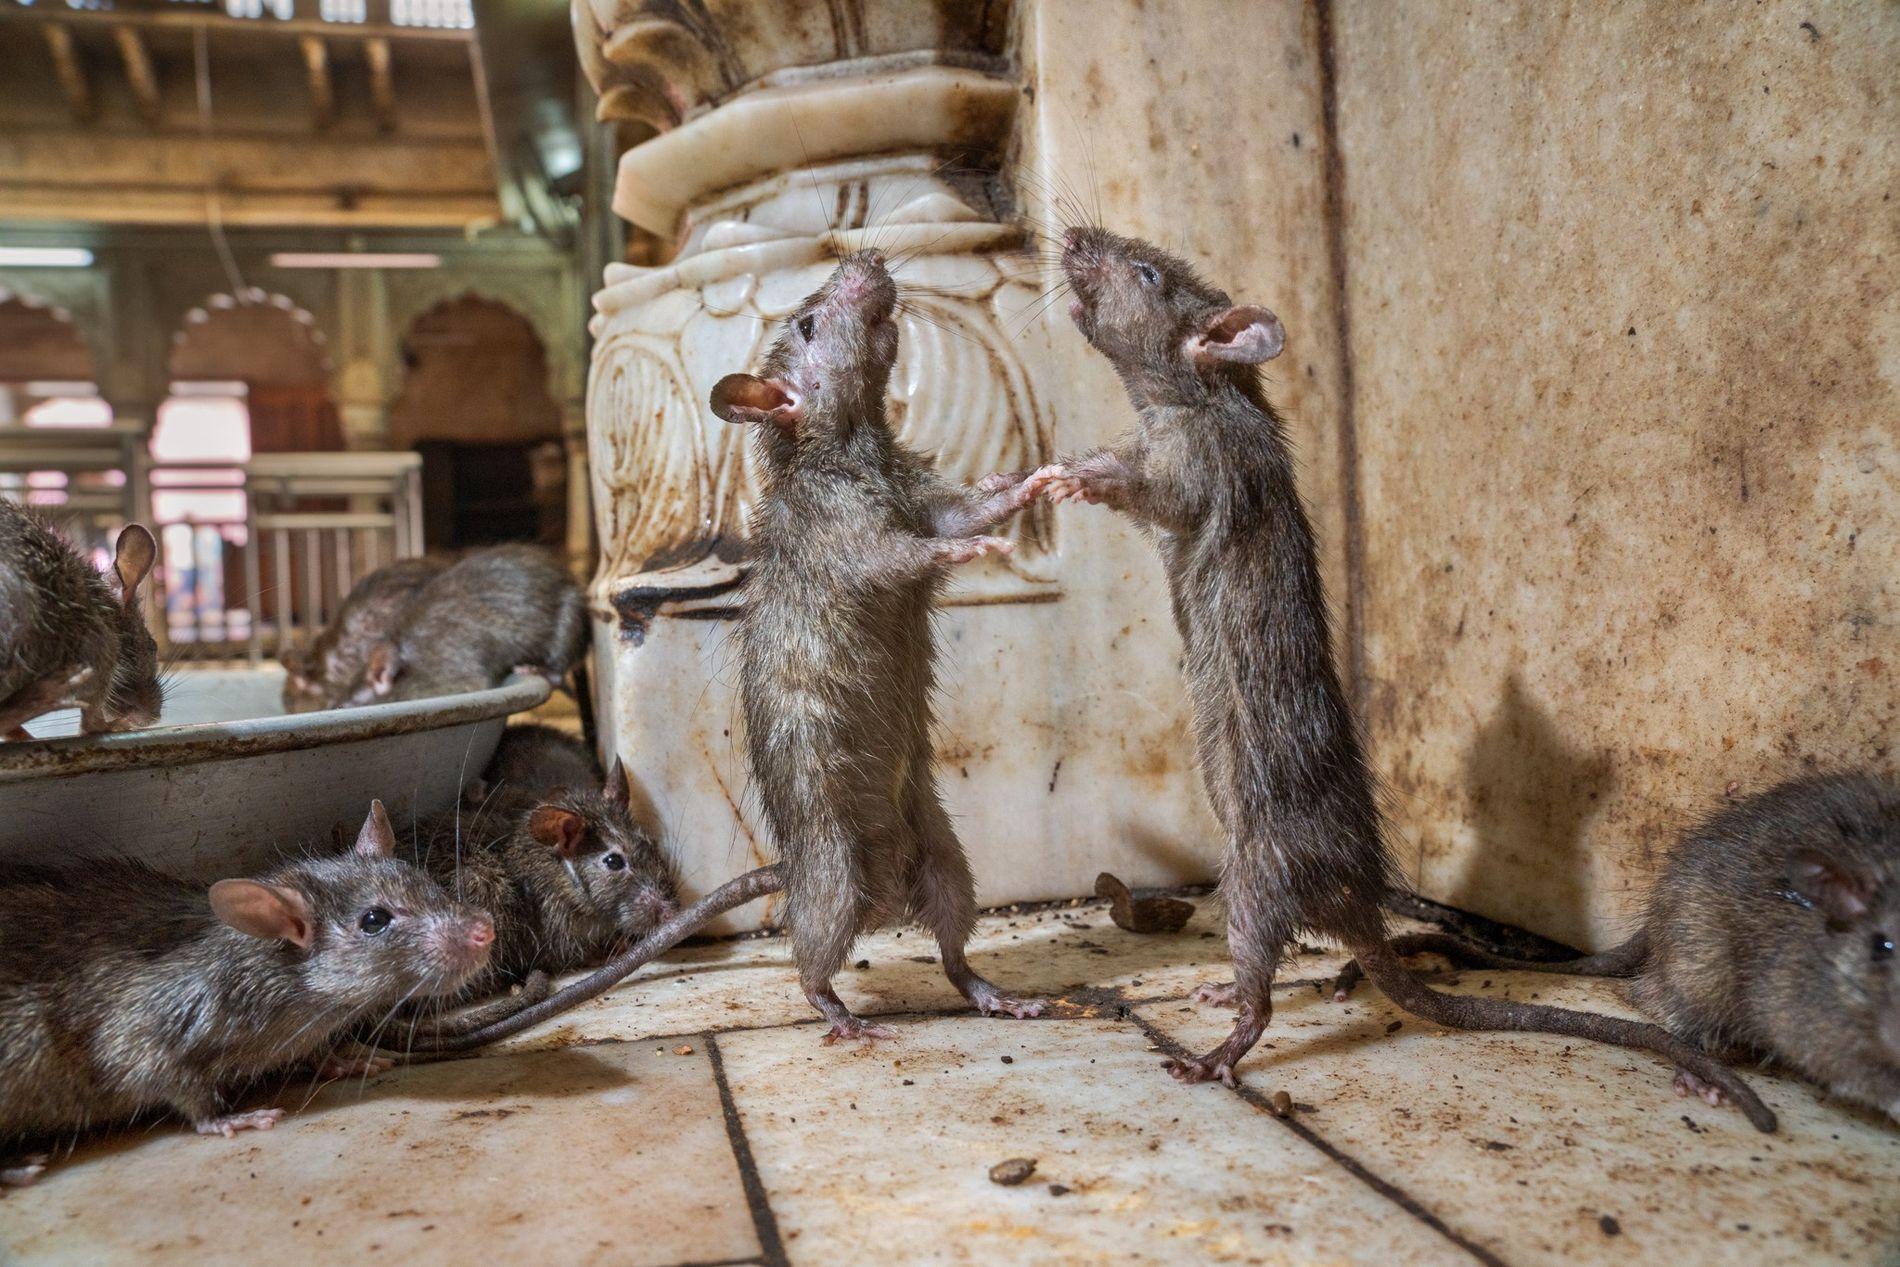 Dois ratos no templo Karni Mata, na Índia, tentam determinar qual é o dominante. Os ratos ...